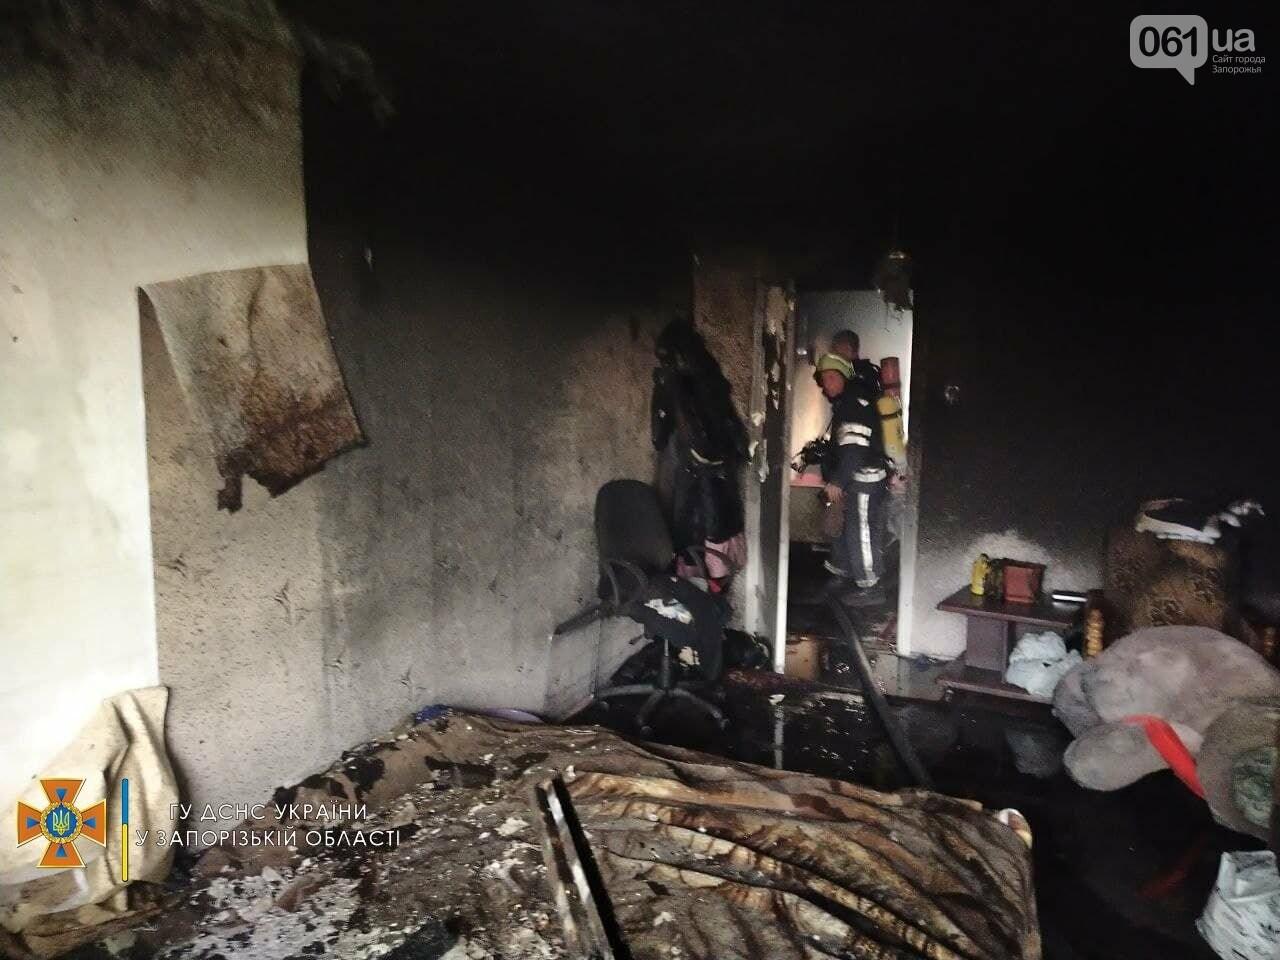 photo2021 09 1210 13 10result 613dd235815e9 - В Запорожье 18 спасателей тушили пожар в девятиэтажке, - ФОТО